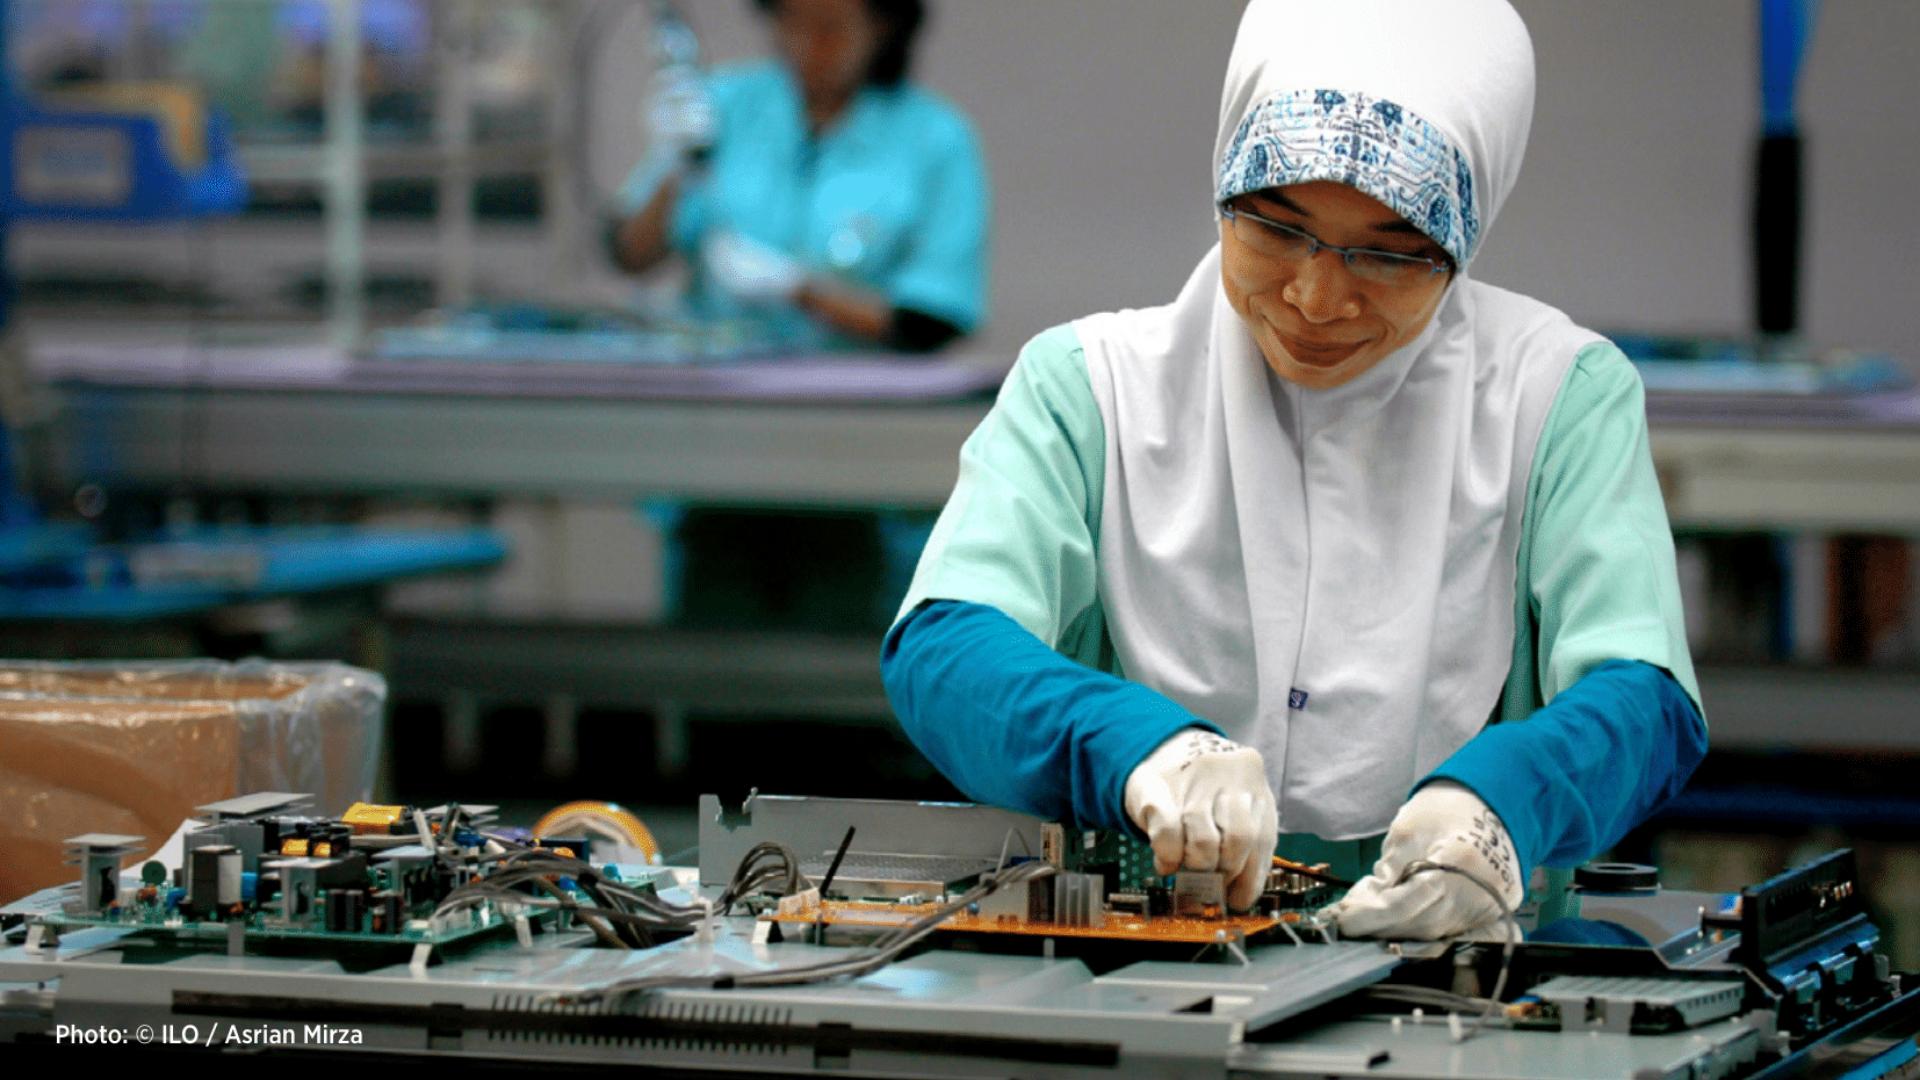 Filipino women in the electronics industry